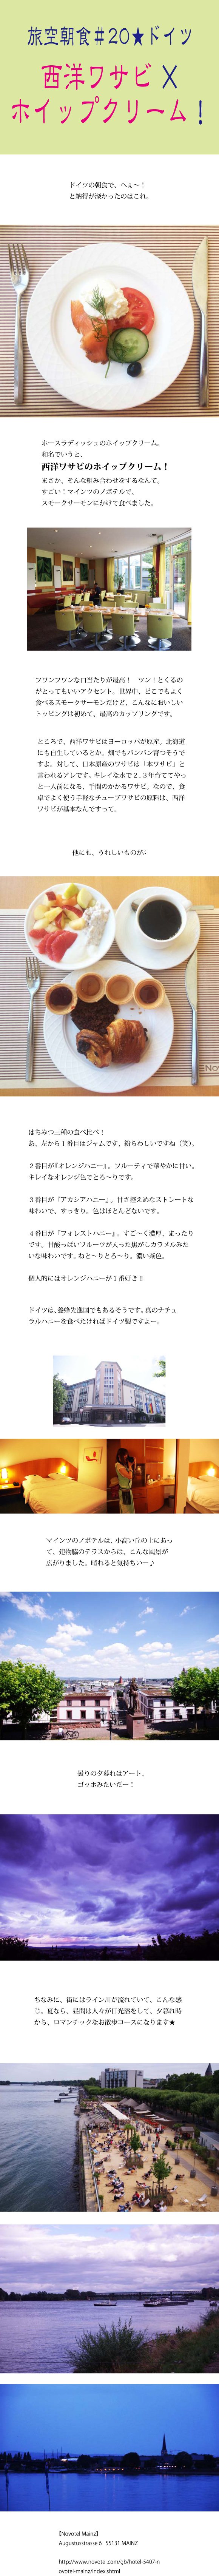 tomako170412.jpg